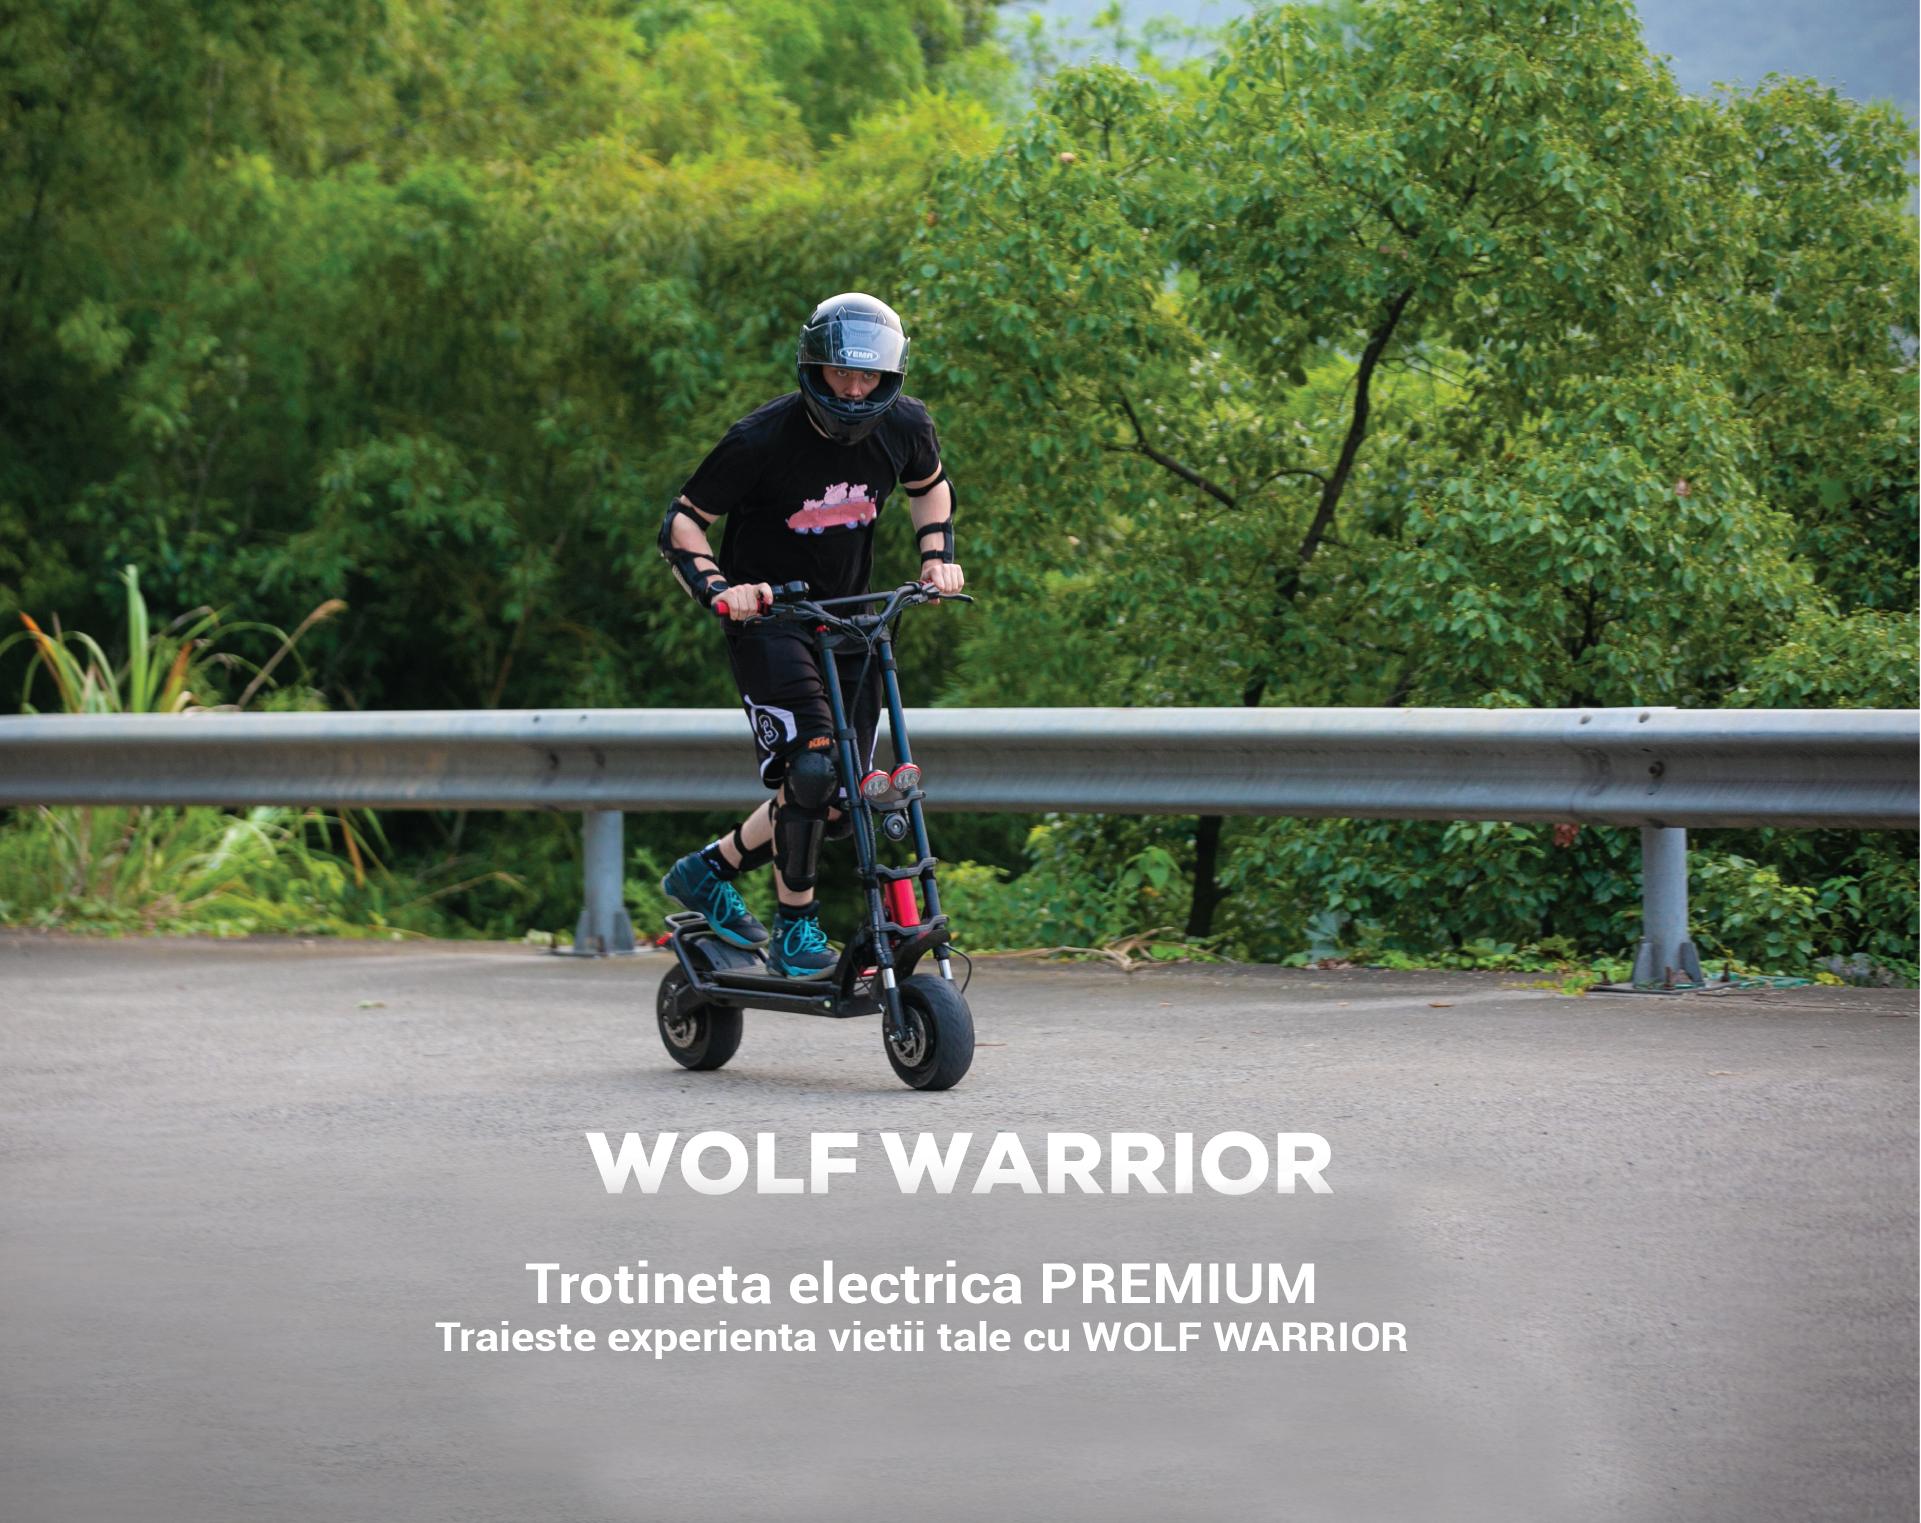 wolf-warrior-trotineta-electrica-kaabo